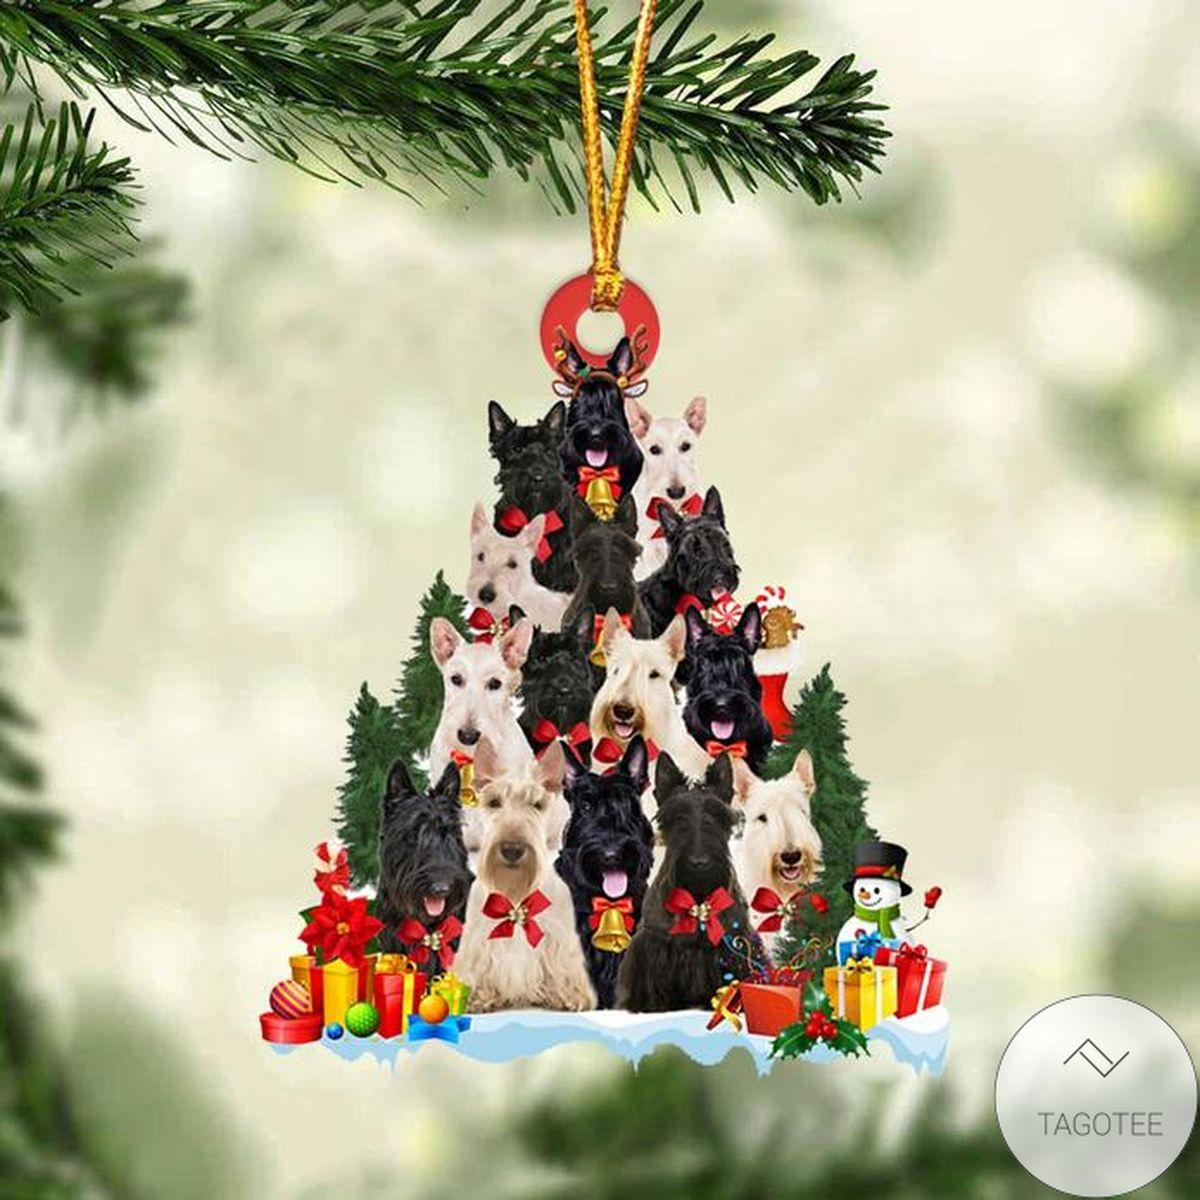 Scottish Terrier Dog Christmas Tree Ornament